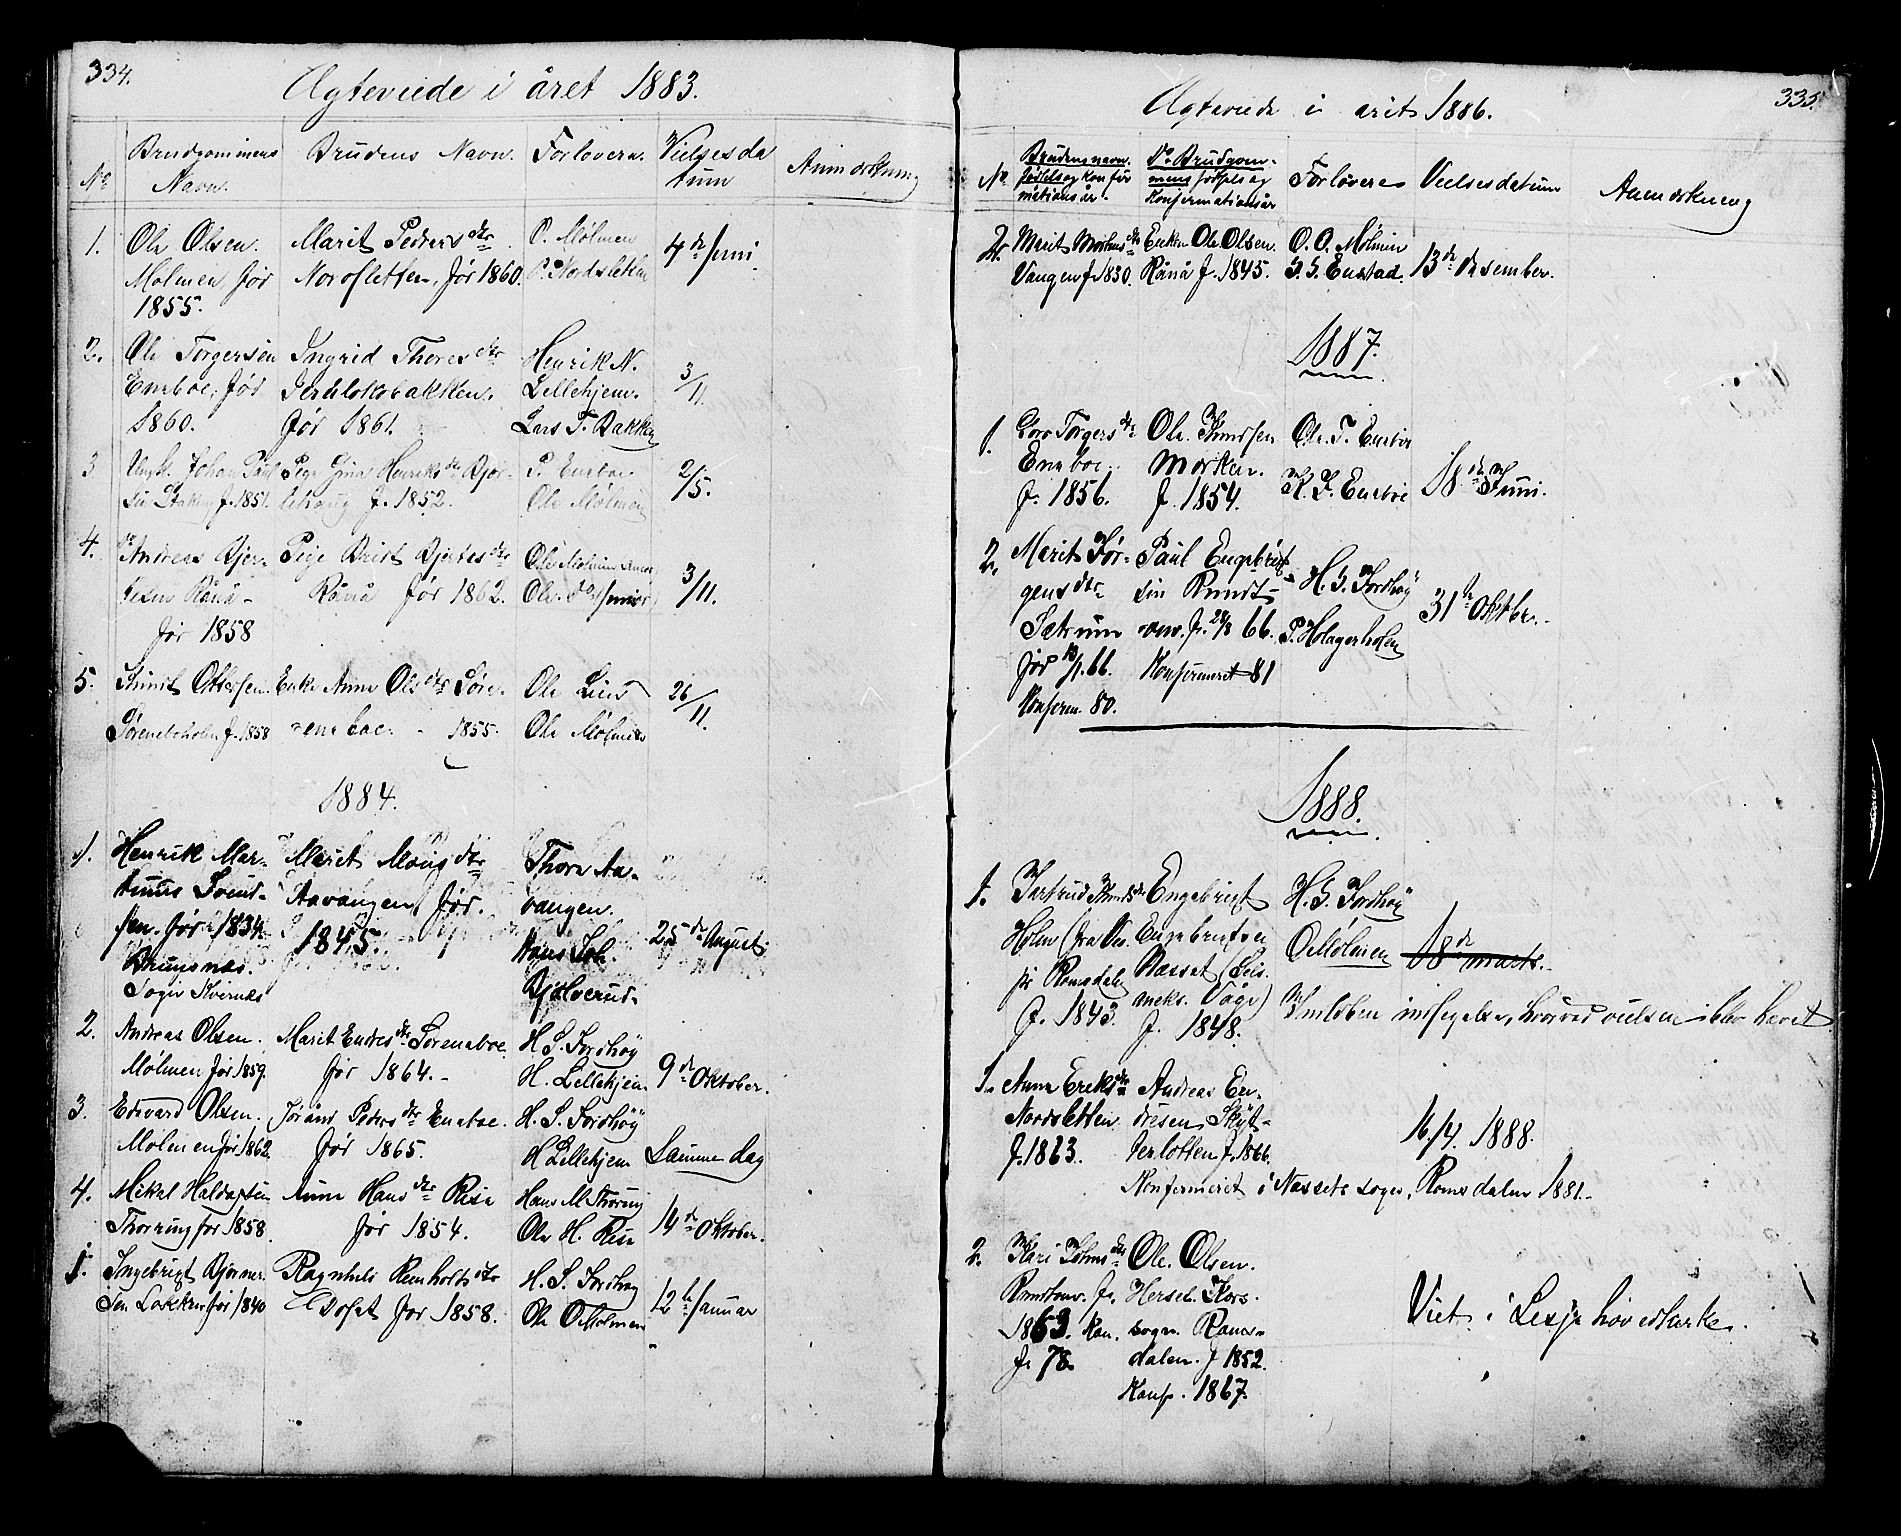 SAH, Lesja prestekontor, Klokkerbok nr. 6, 1871-1904, s. 334-335